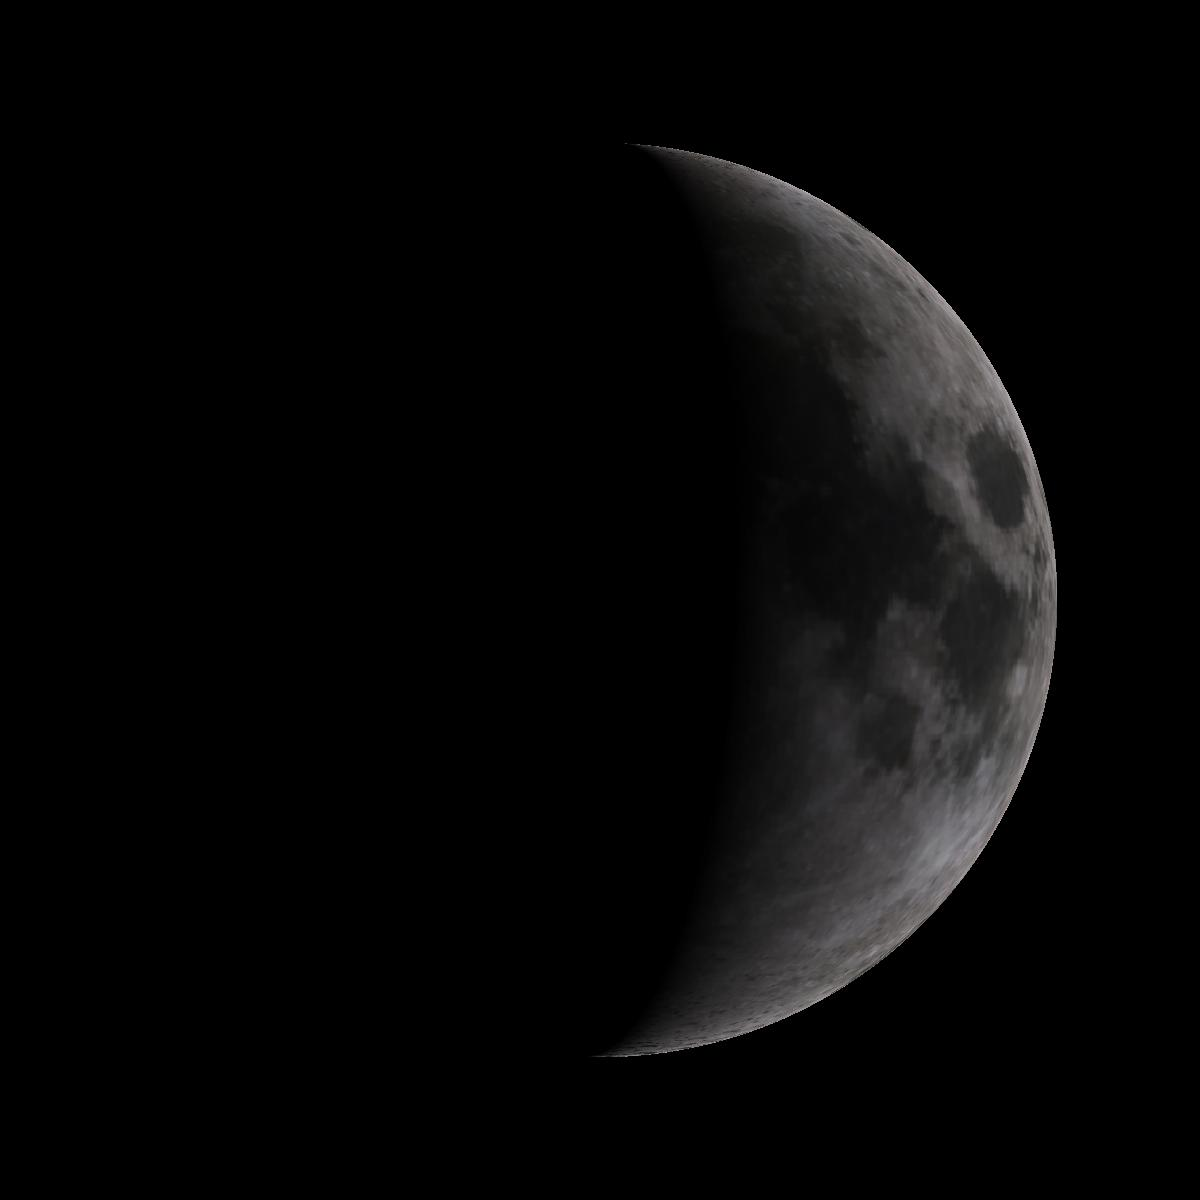 Lune du 31 mars 2020